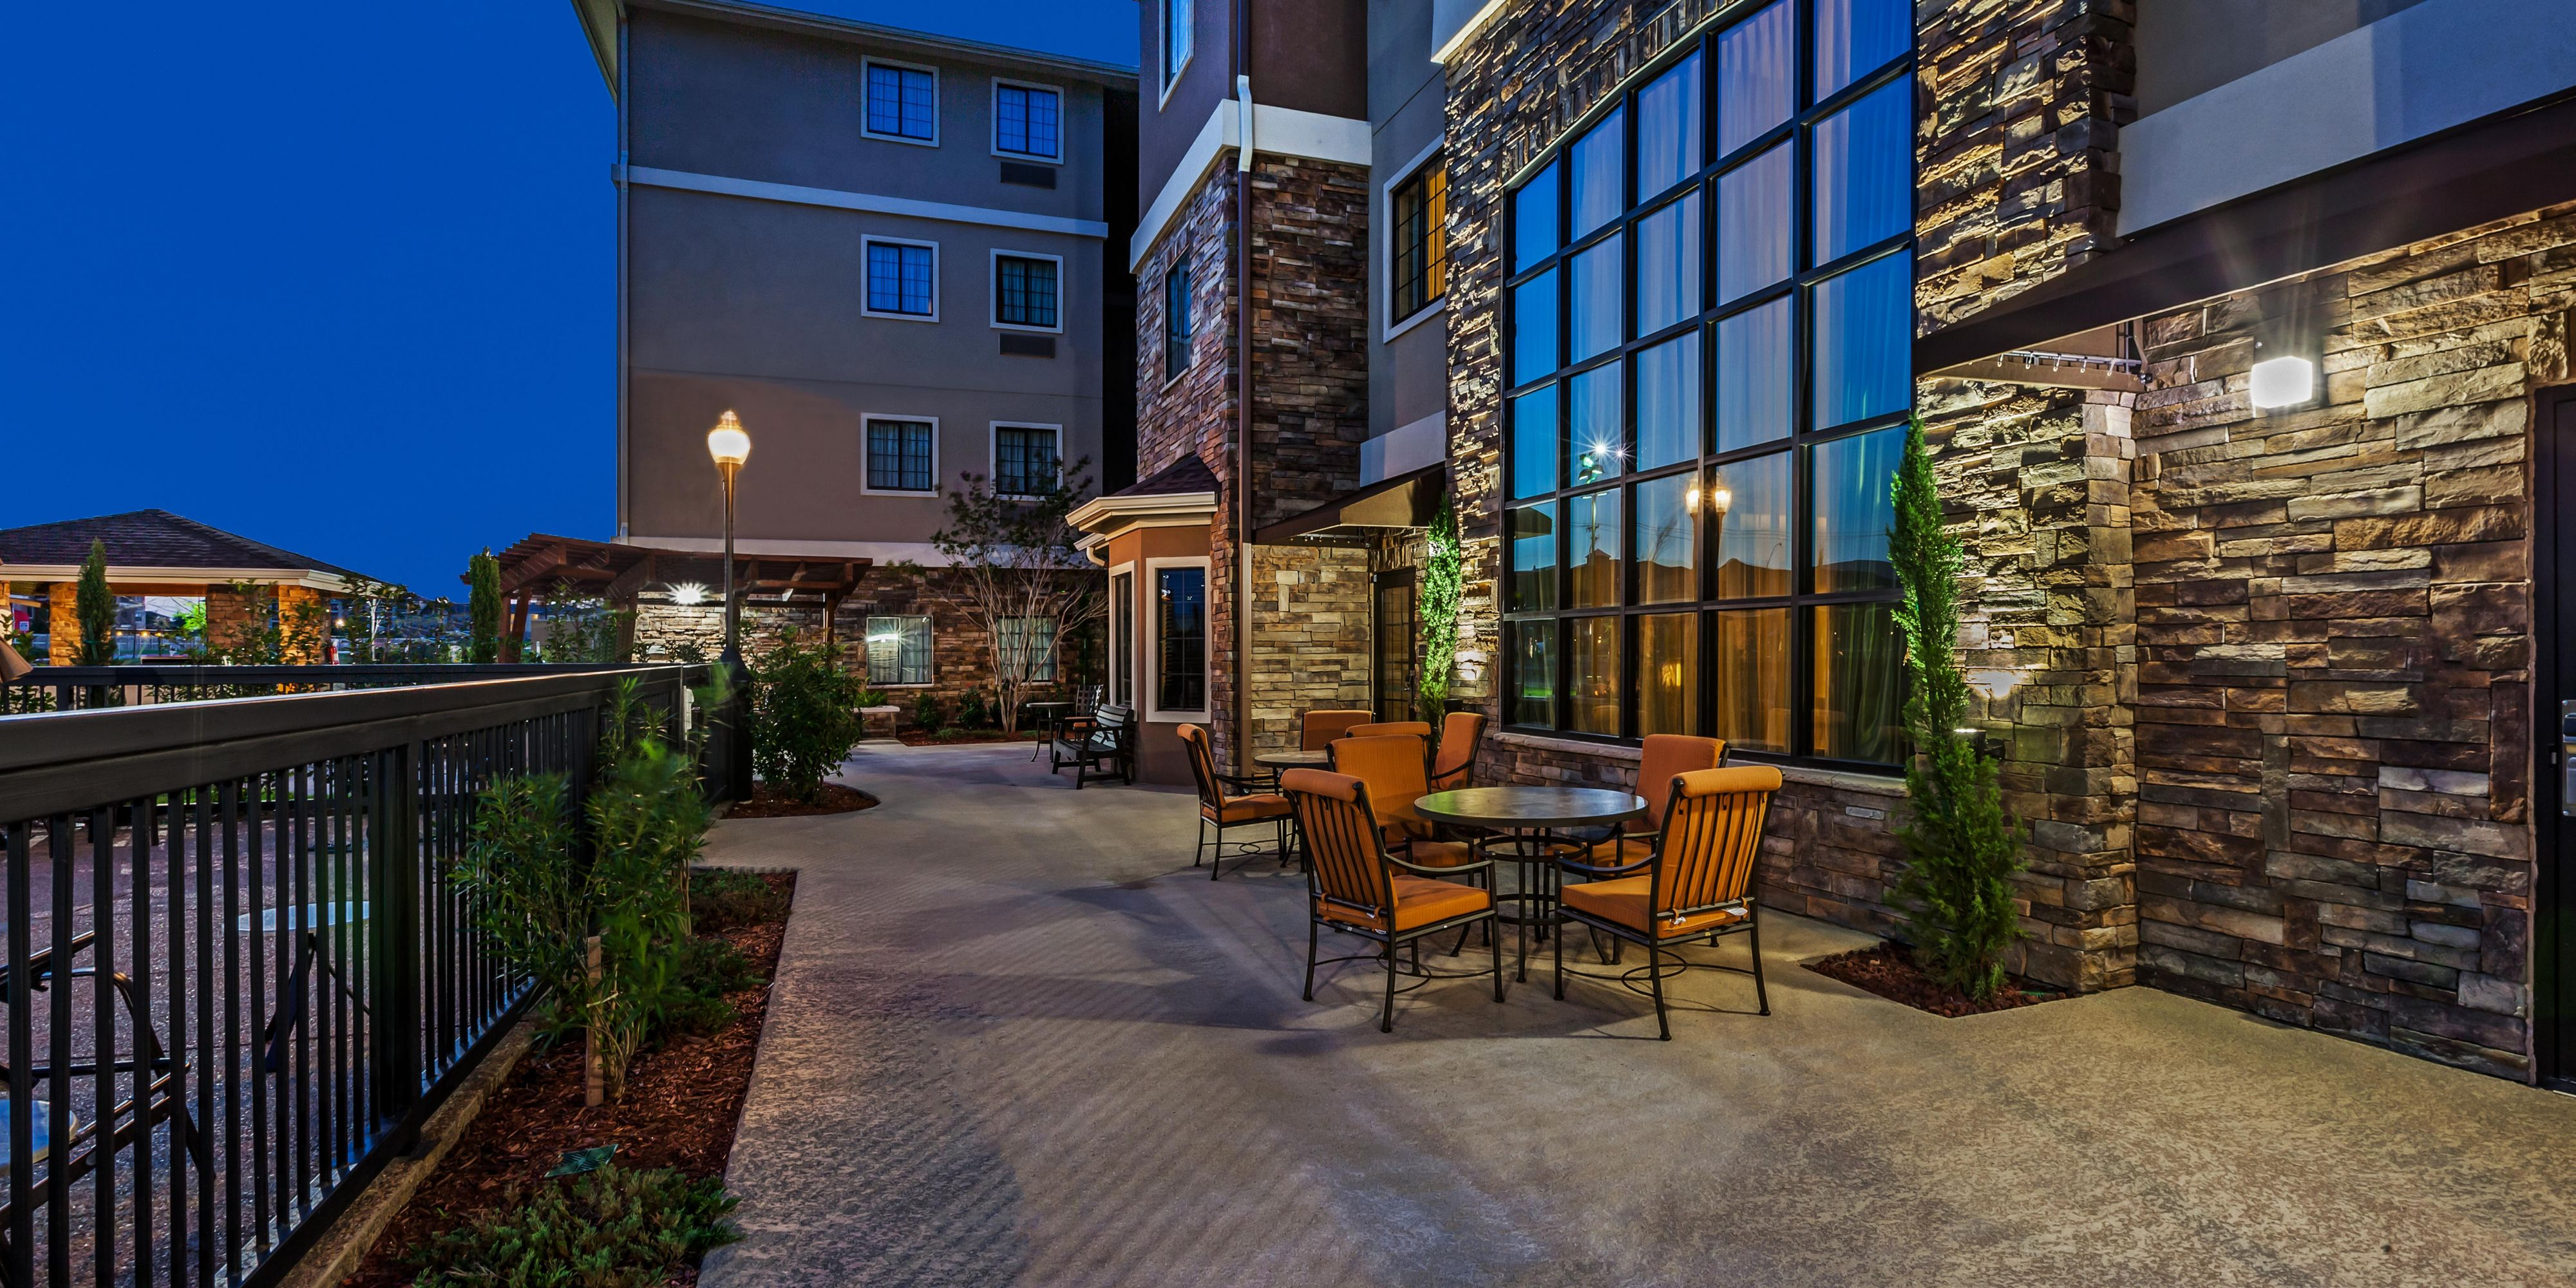 Staybridge Suites Fort Worth Fossil Creek Free Internet